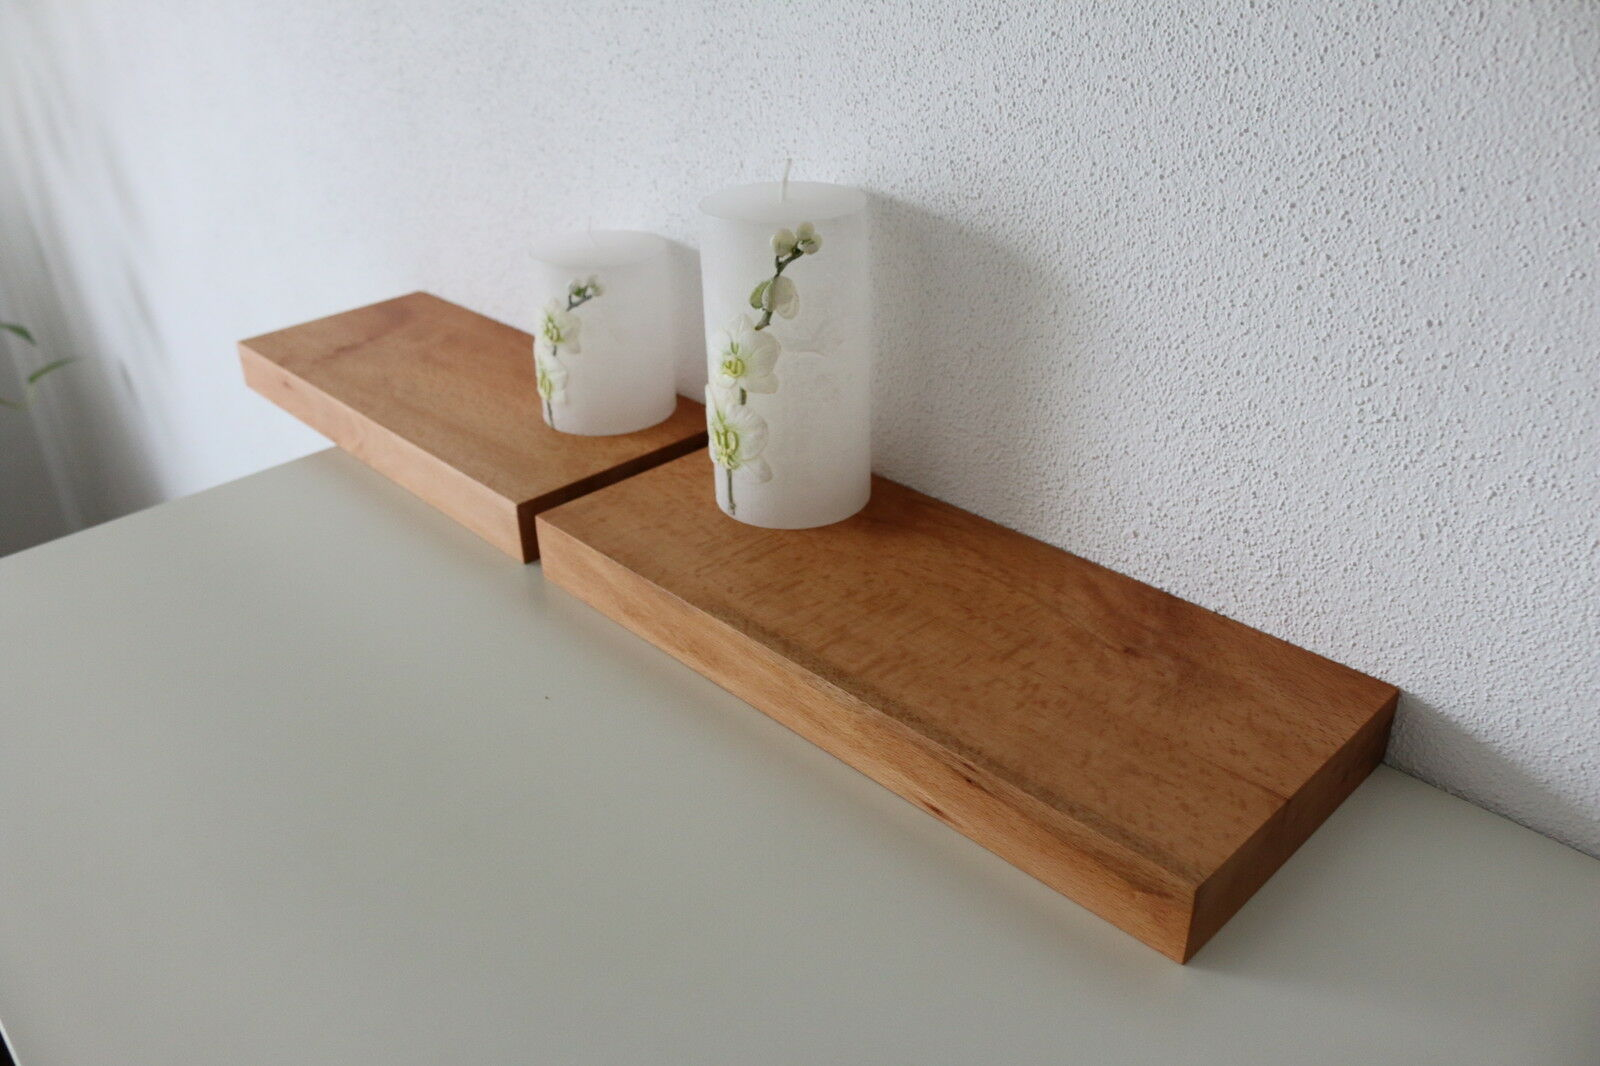 2x wandboard buche massiv holz board regal steckboard. Black Bedroom Furniture Sets. Home Design Ideas